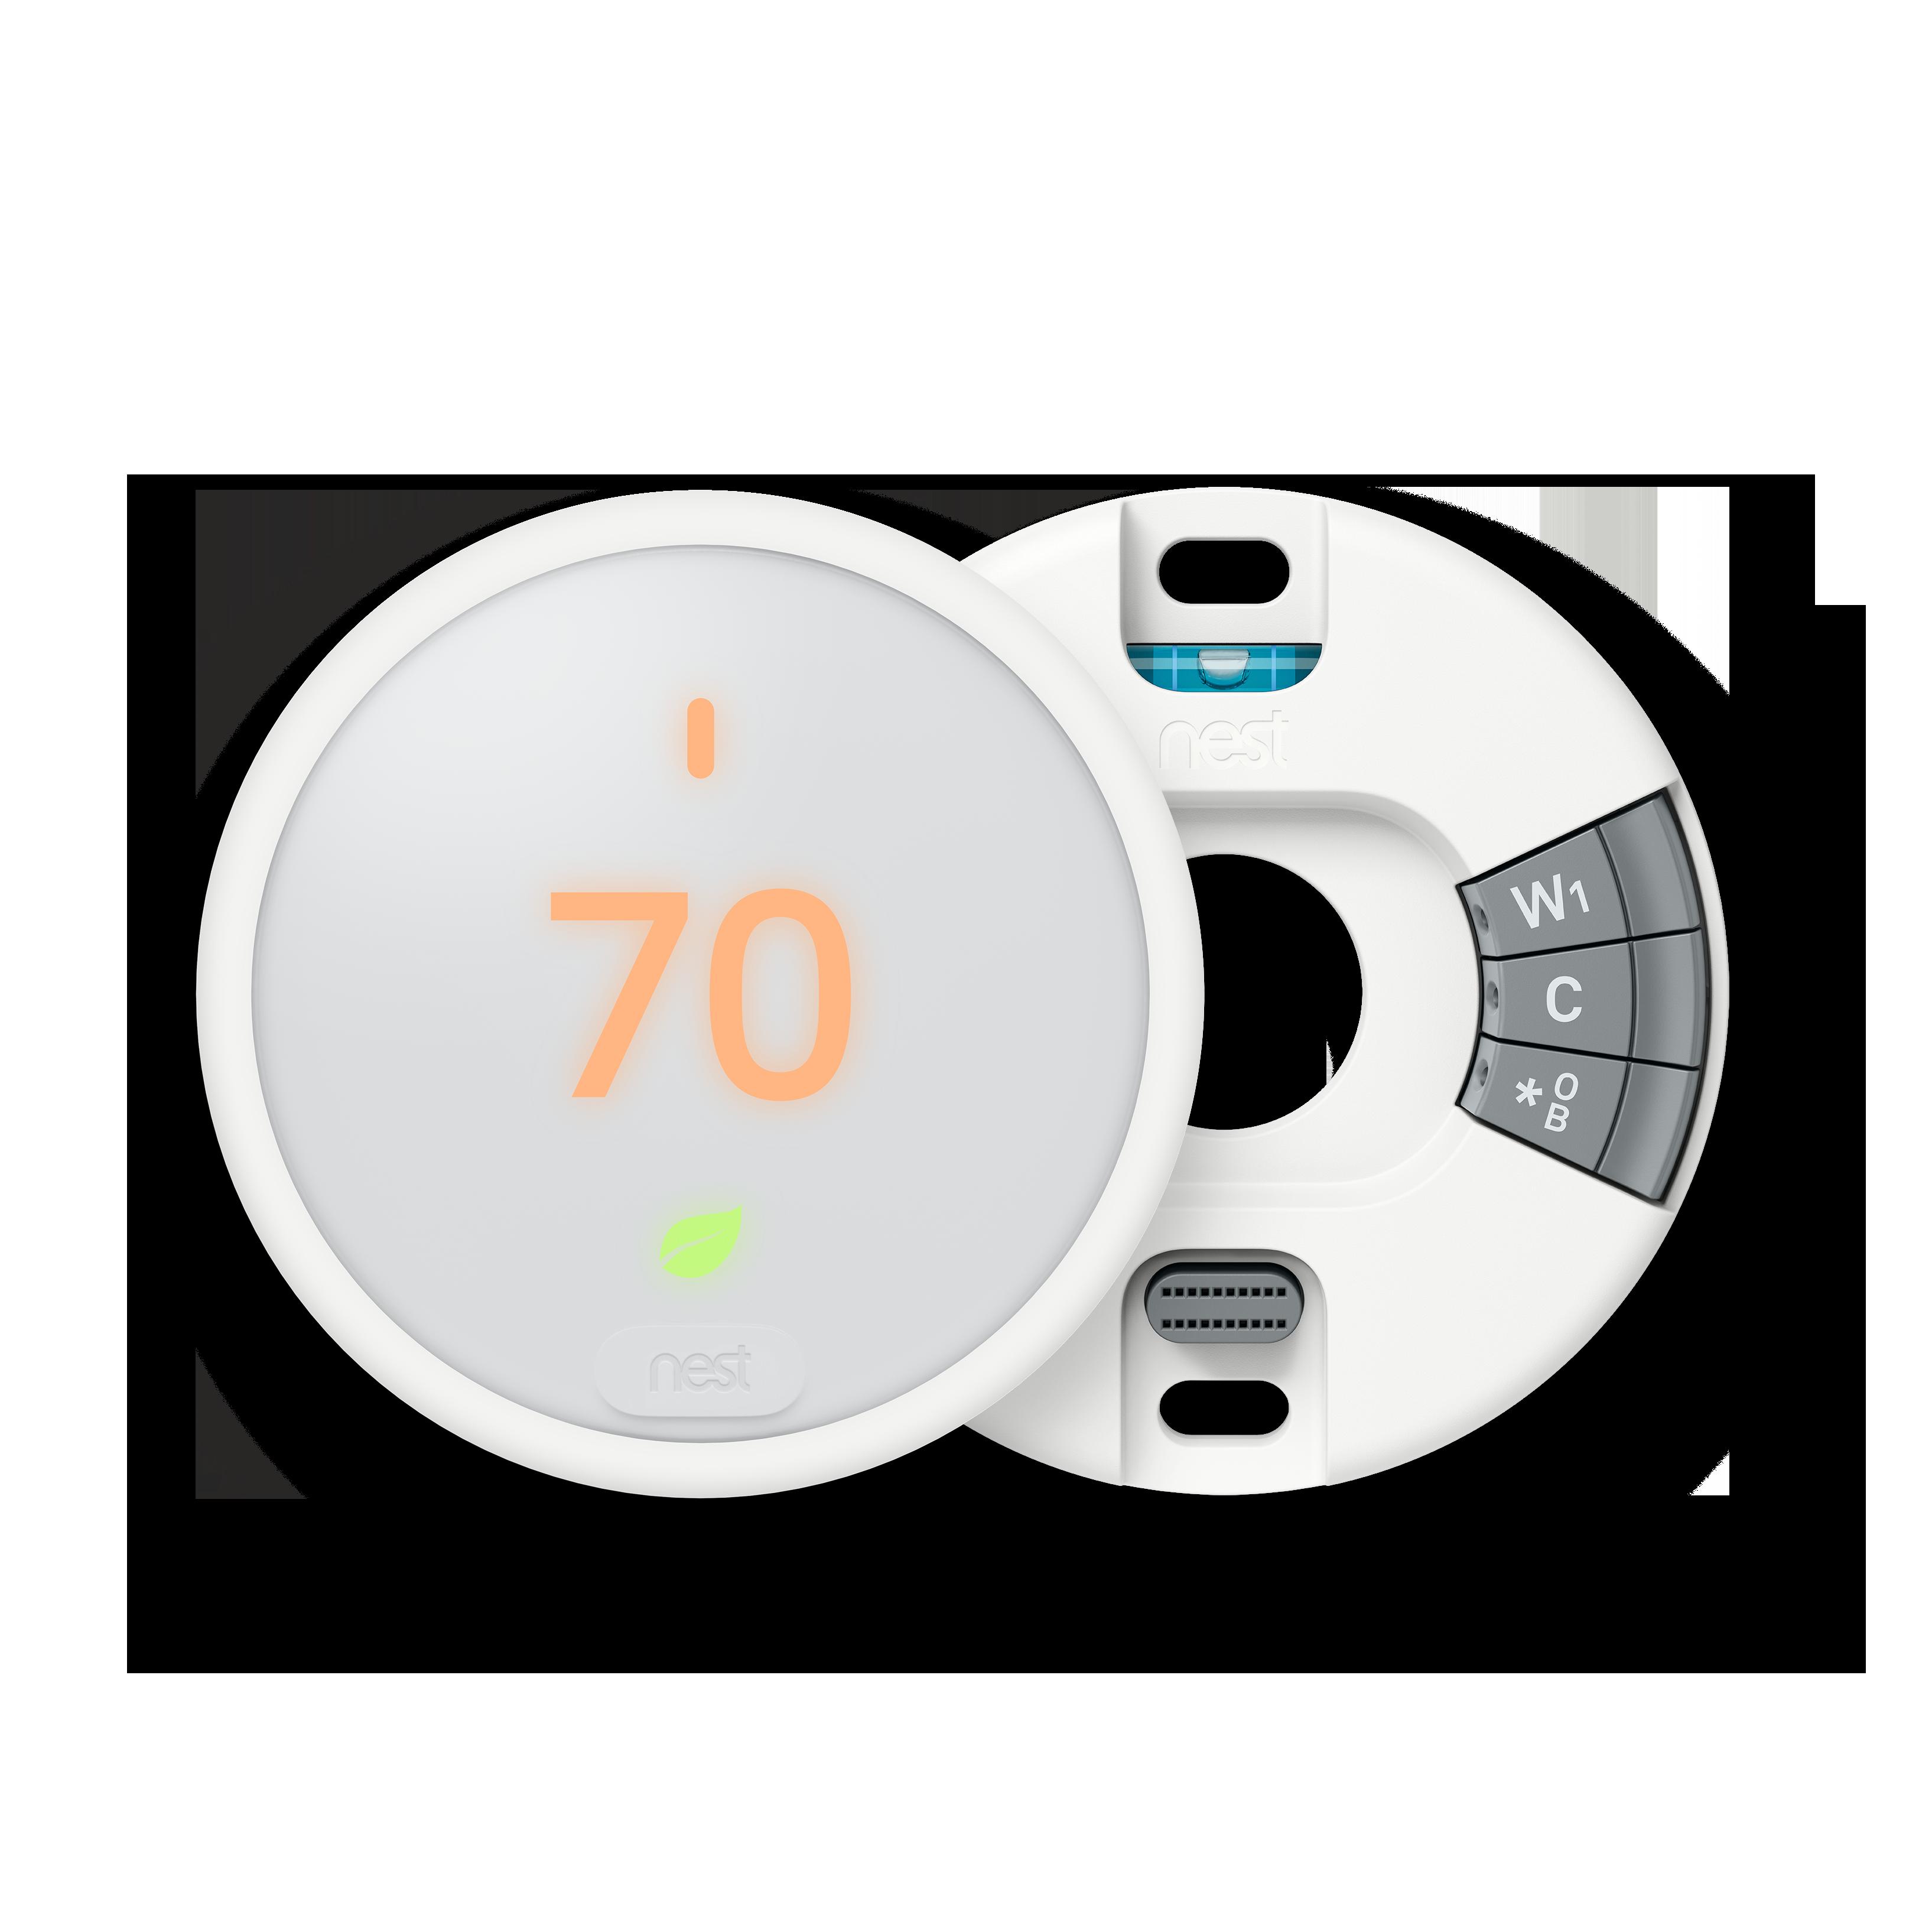 Nest Thermostat E Wiring Diagram Info Bryant Schematics Diagrams Rh Nestorgarcia Co Braeburn 2200